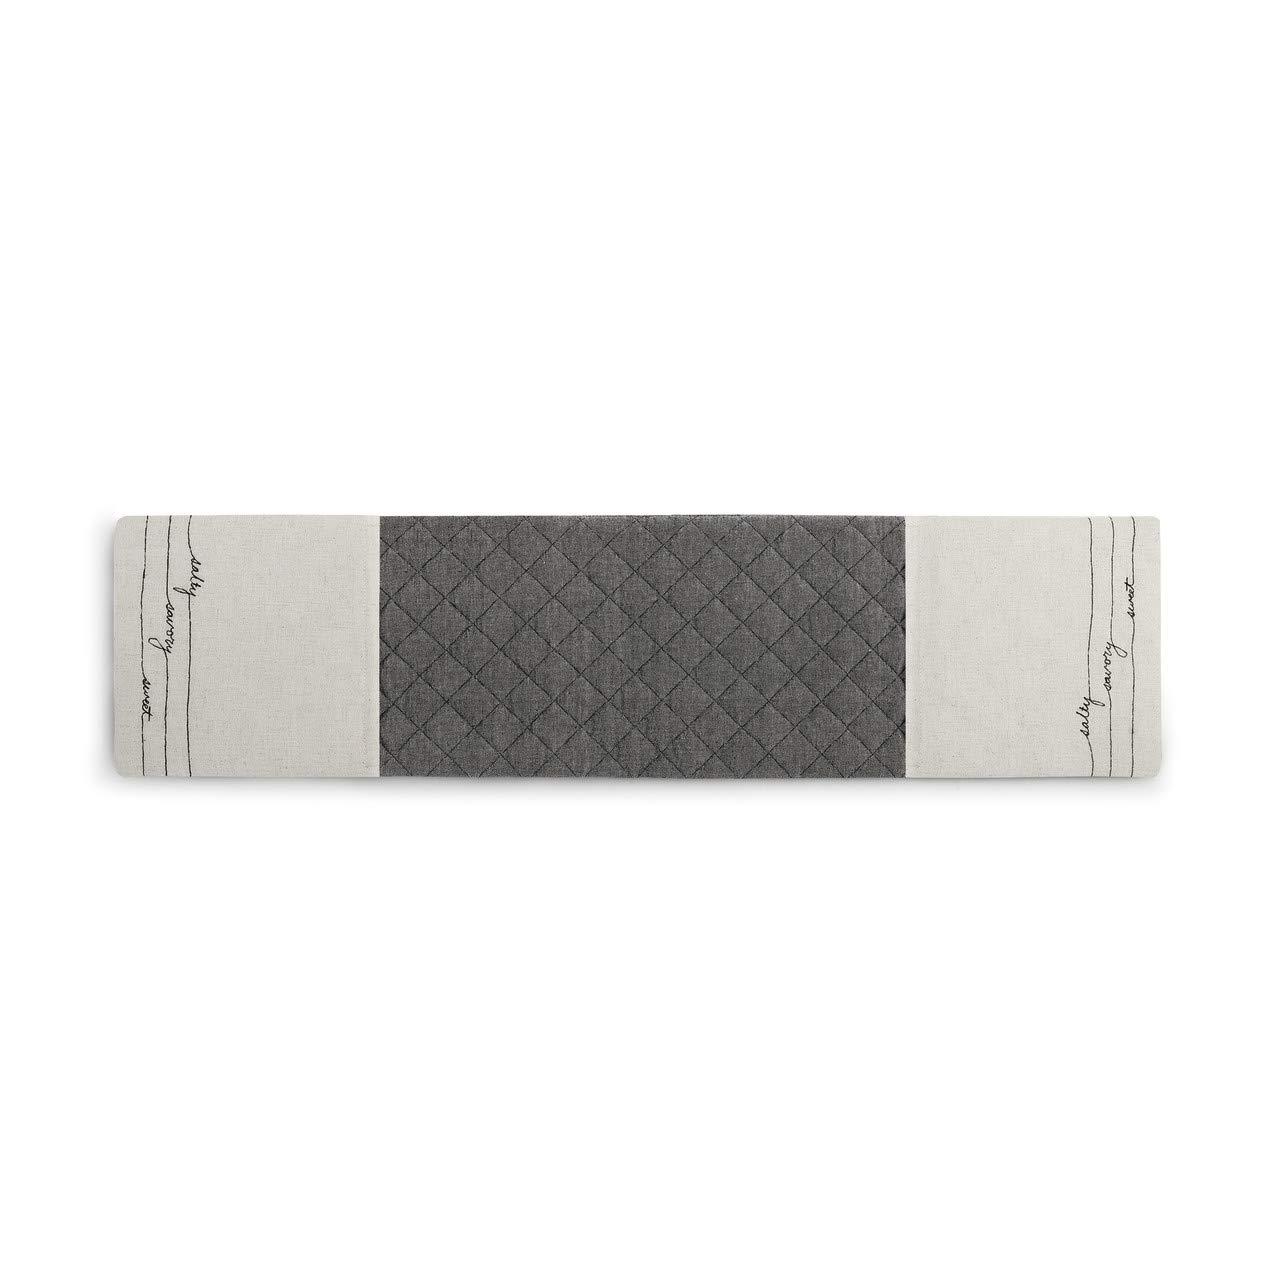 Salty Savory Sweet Slate Grey 30 x 8 Cotton Blend Fabric Double Oven Mitt